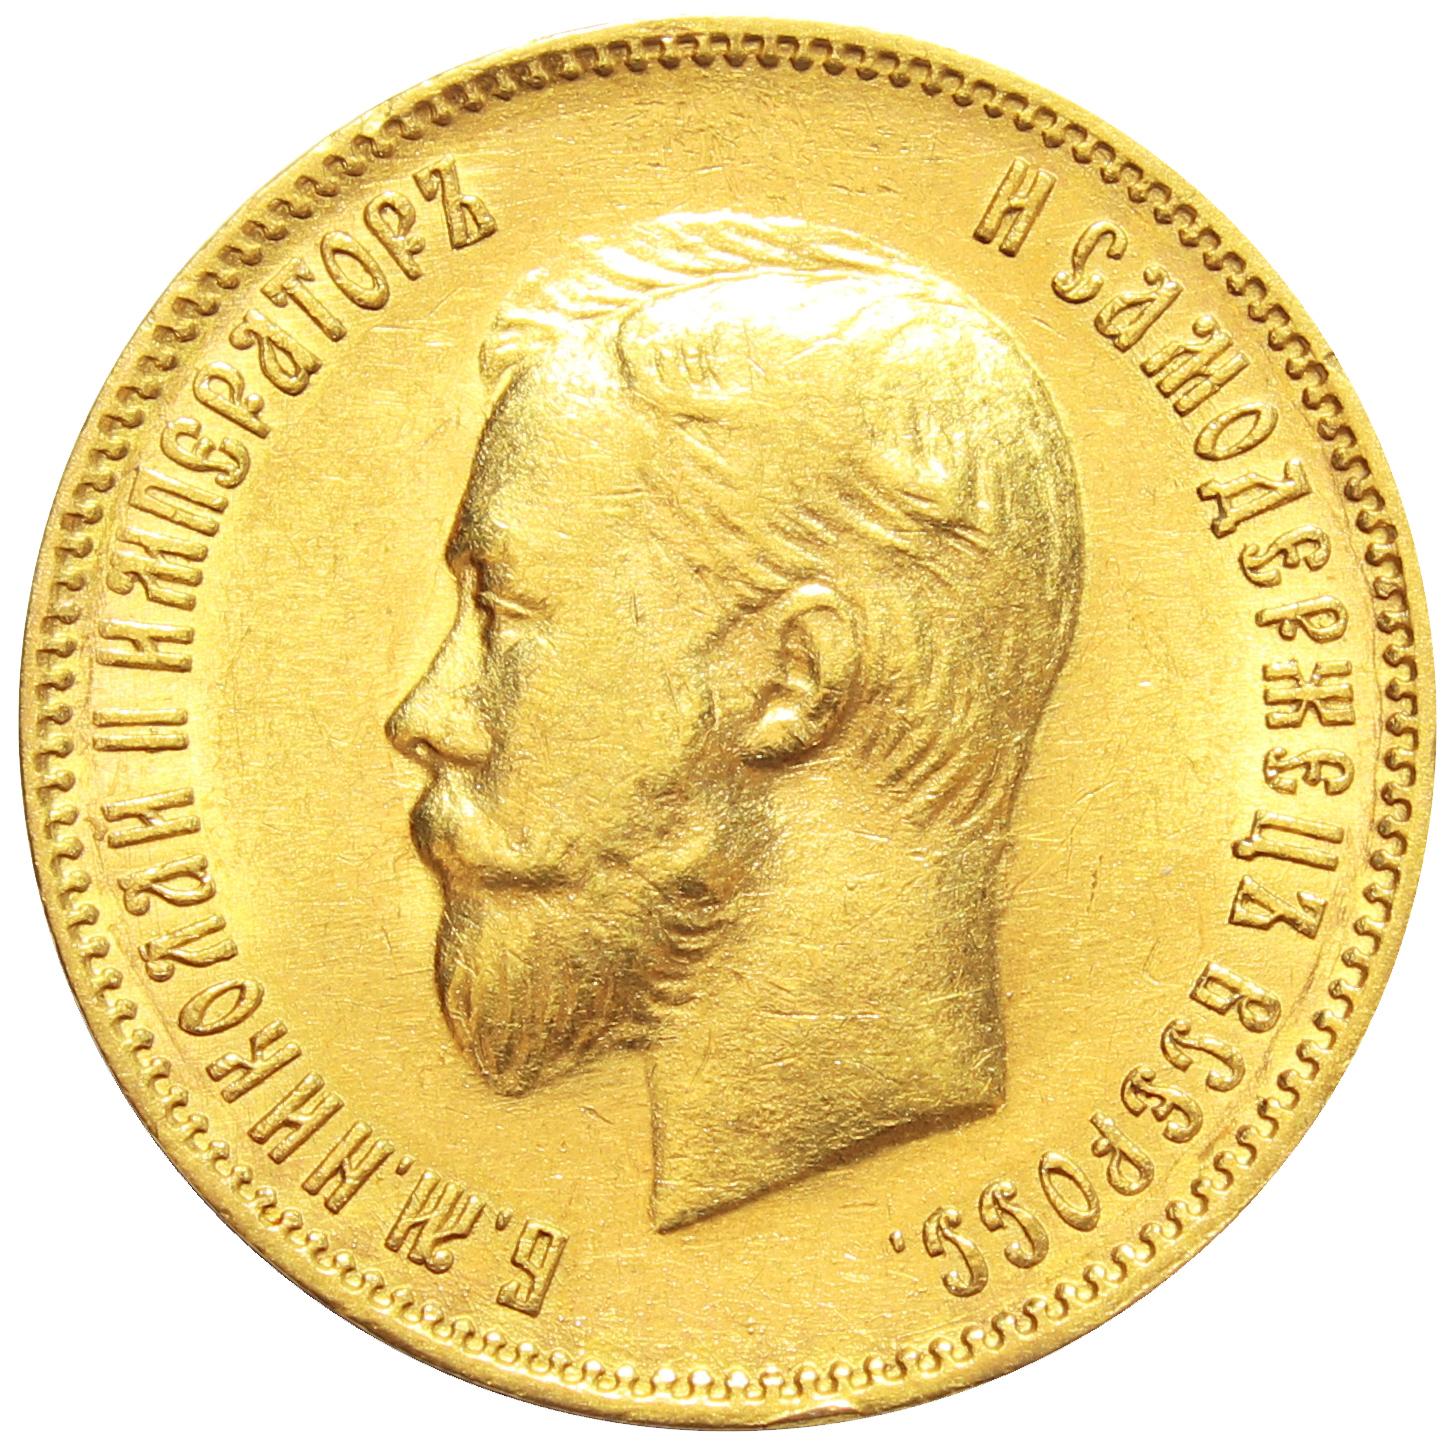 10 рублей 1903 год (АР). Николай II